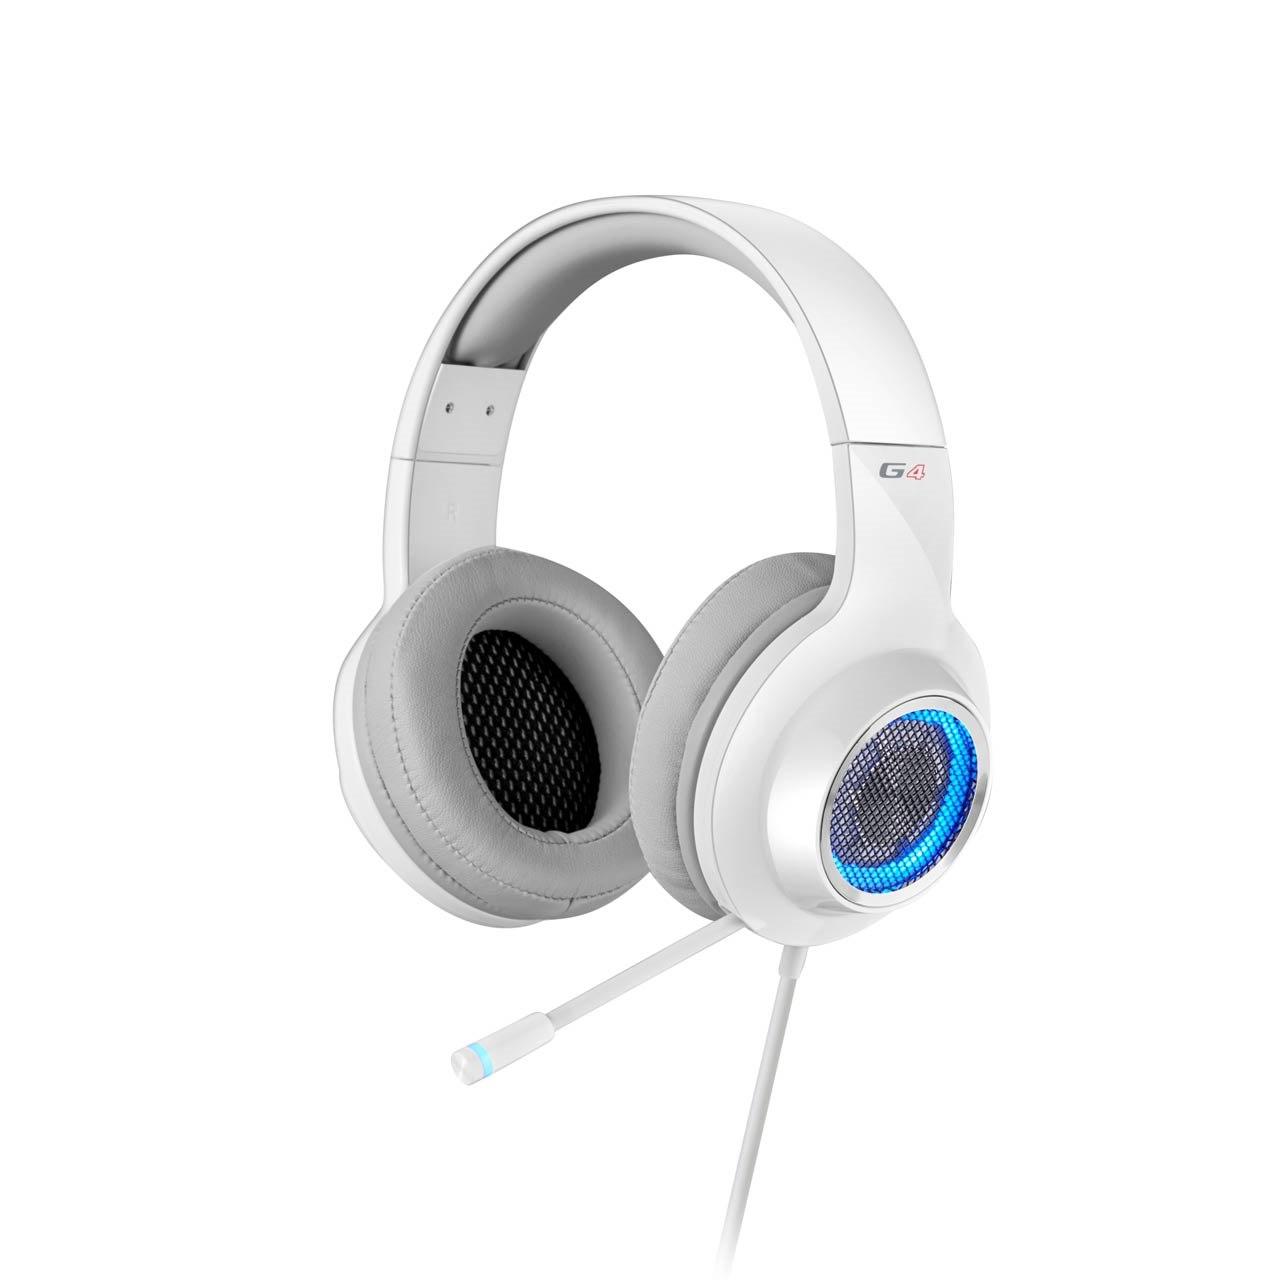 Edifier V4 (G4) 7.1 Virtual Surround Sound Usb Gaming Headset White